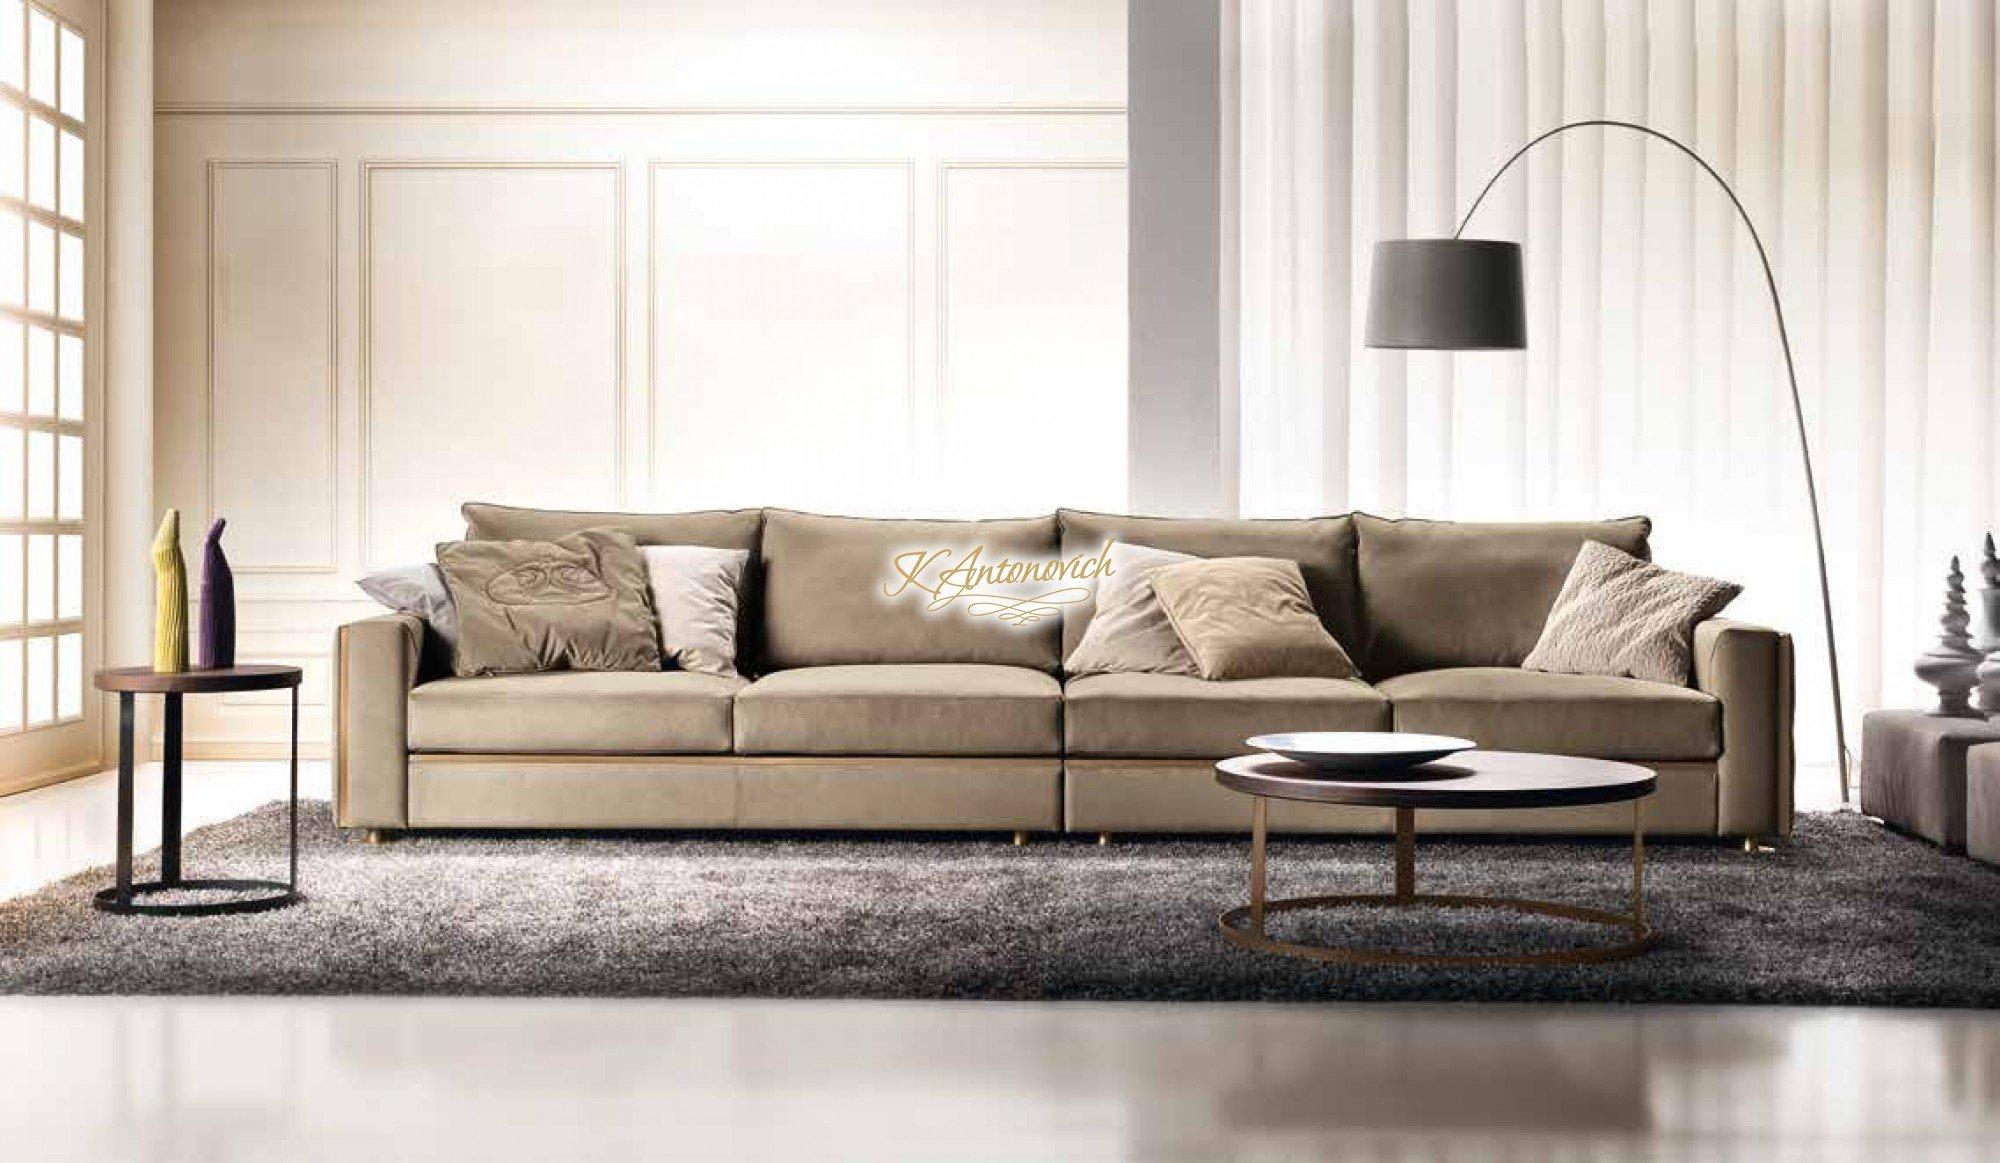 Dacian groza dacian groza we've all seen cold rooms with furnishings lined inelegantly aga. Modern italian living room furniture - luxury interior ...